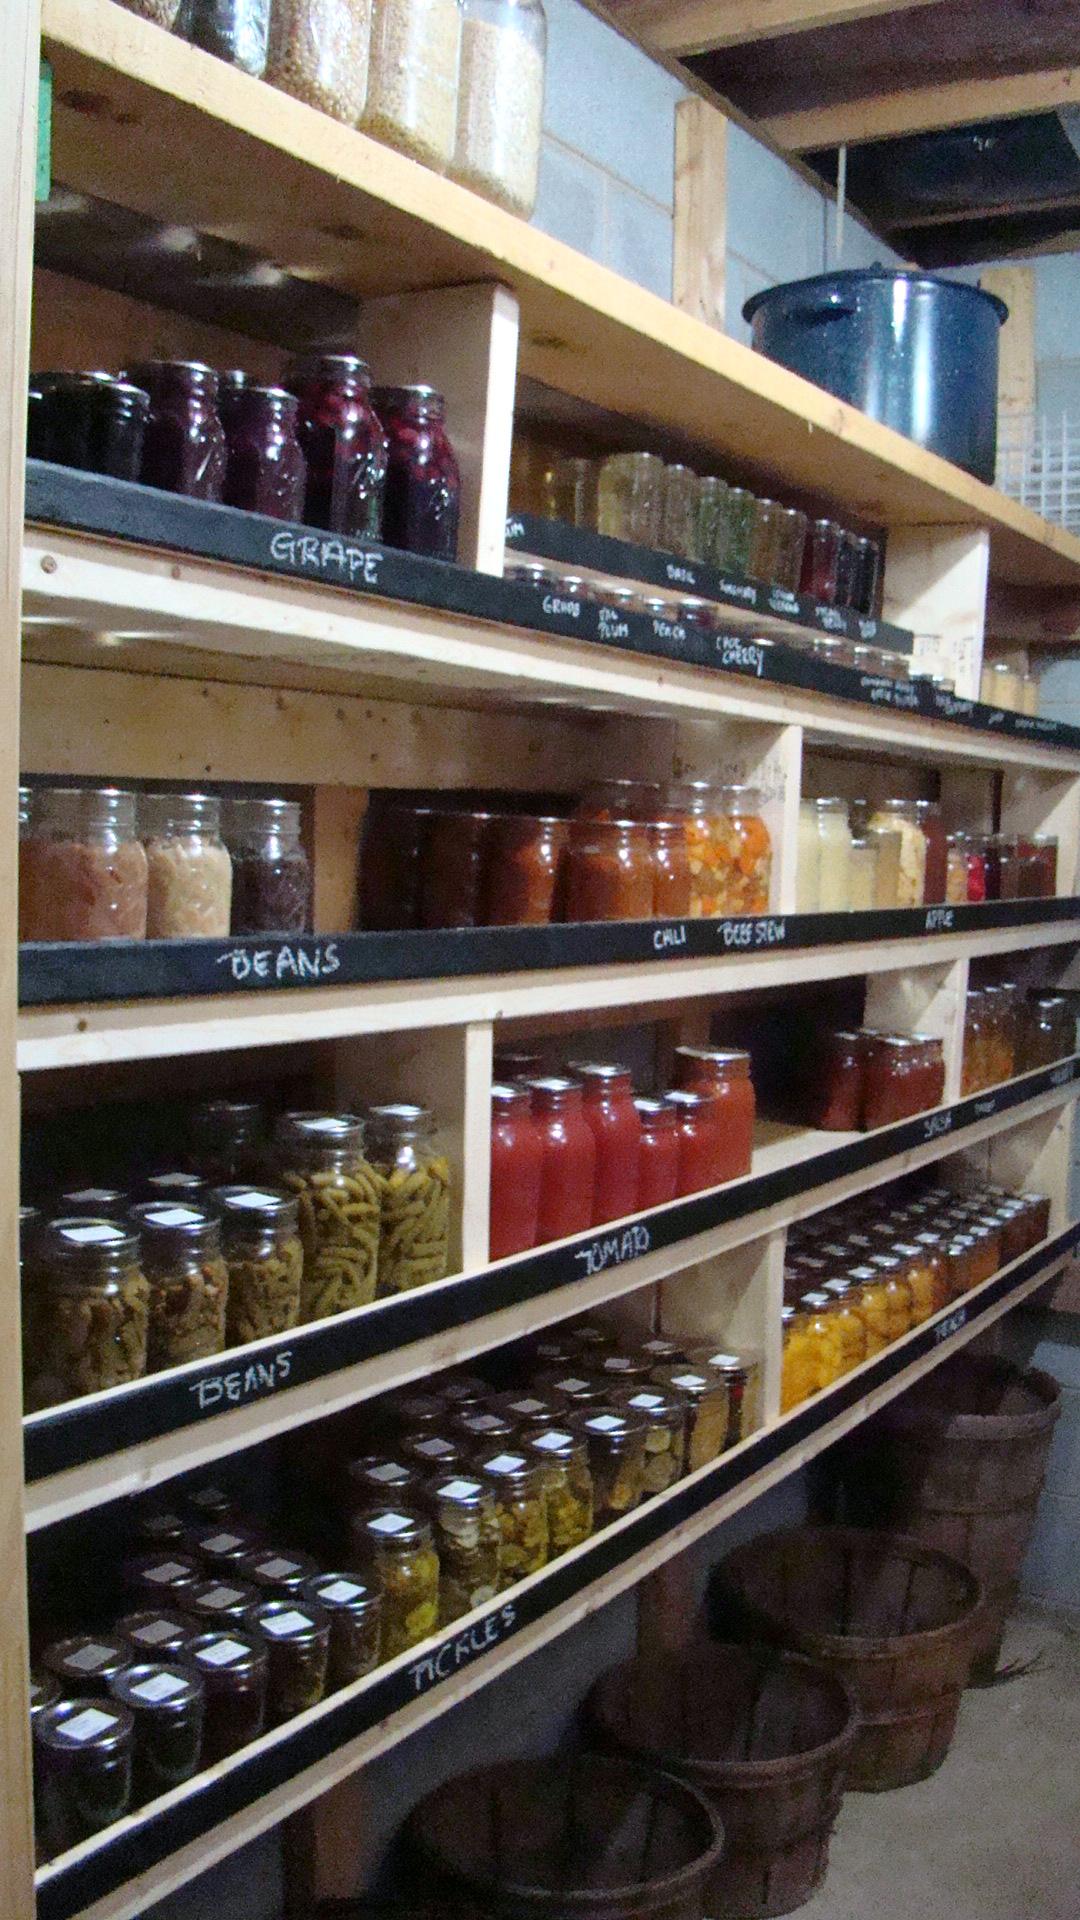 Unfinished basement storage ideas - Basement Organization Tips 15